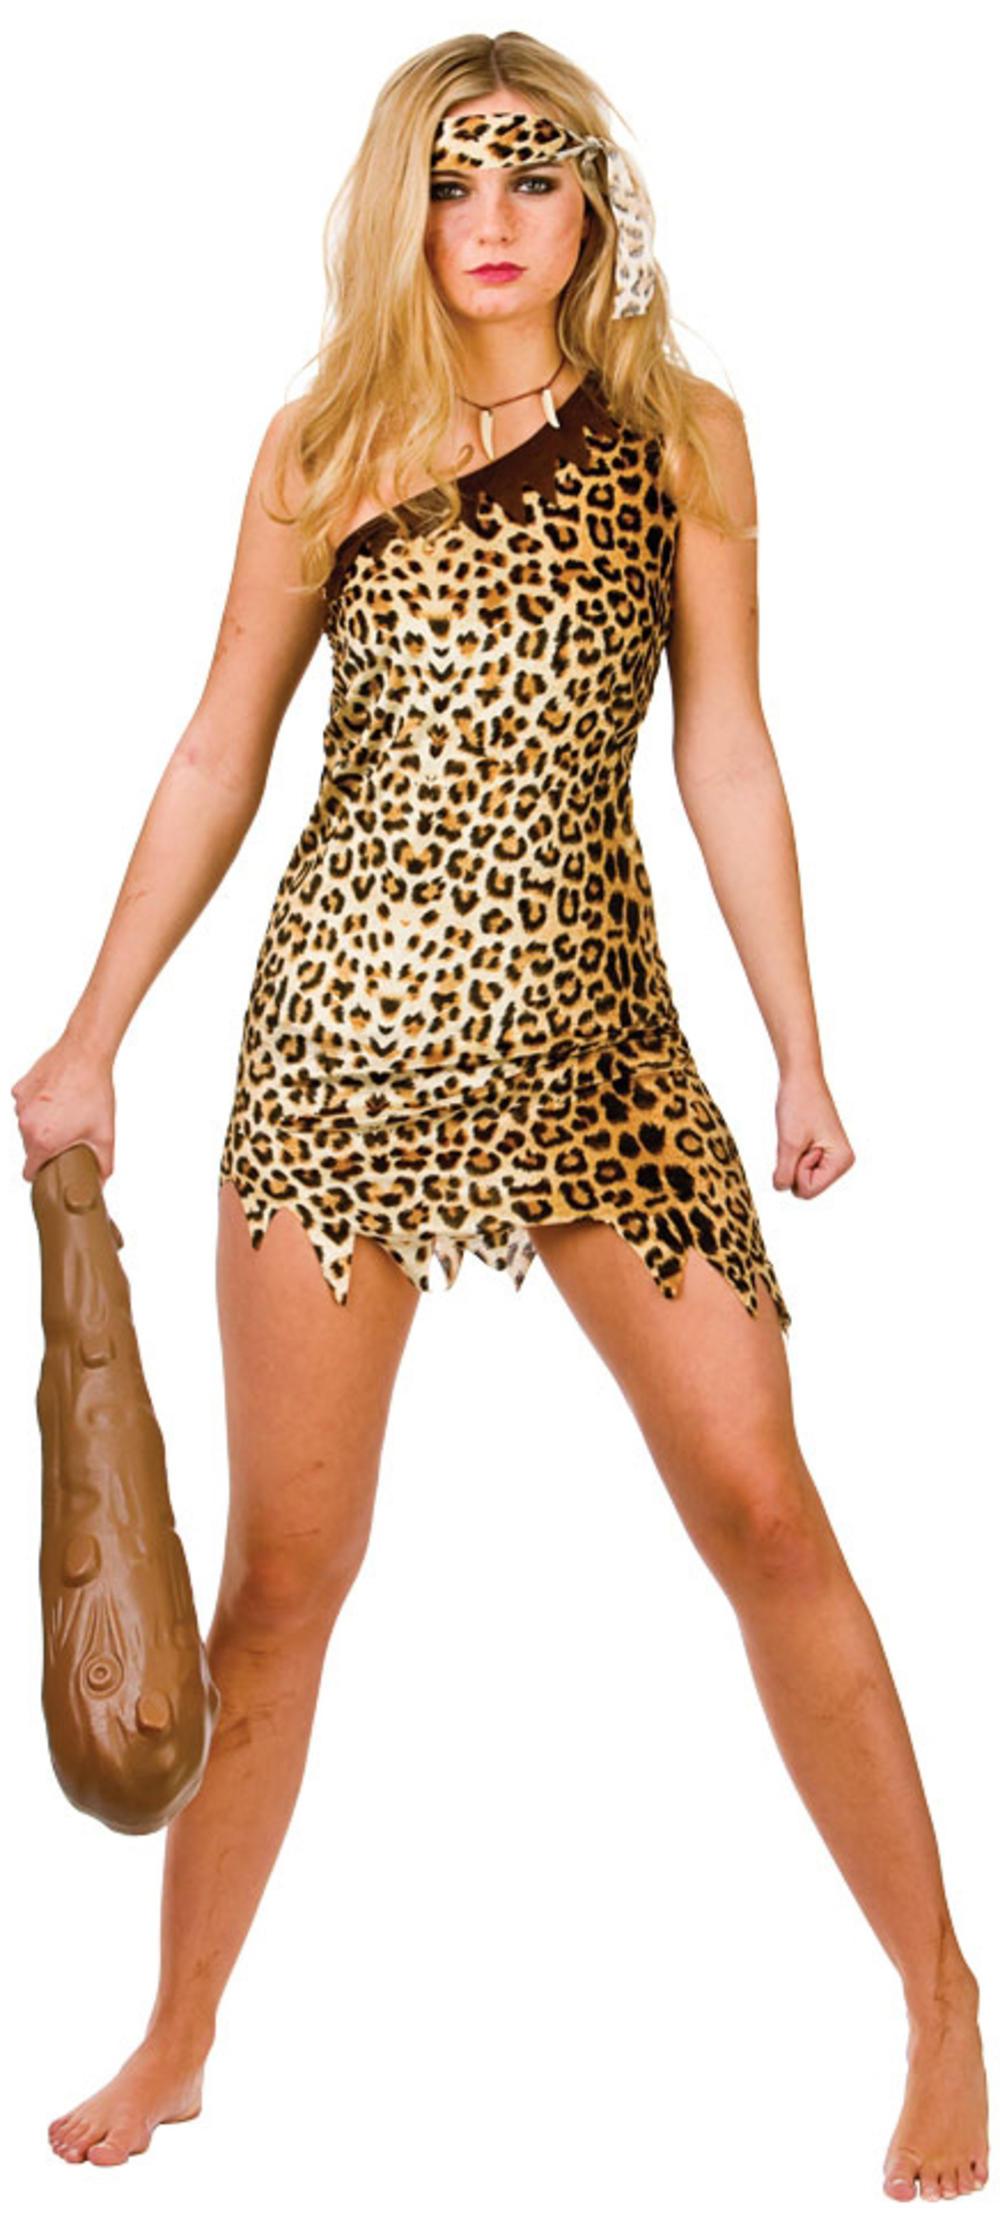 Cute Cavegirl Ladies Cave Woman Fancy Dress Womens Flintstones Adults Costume